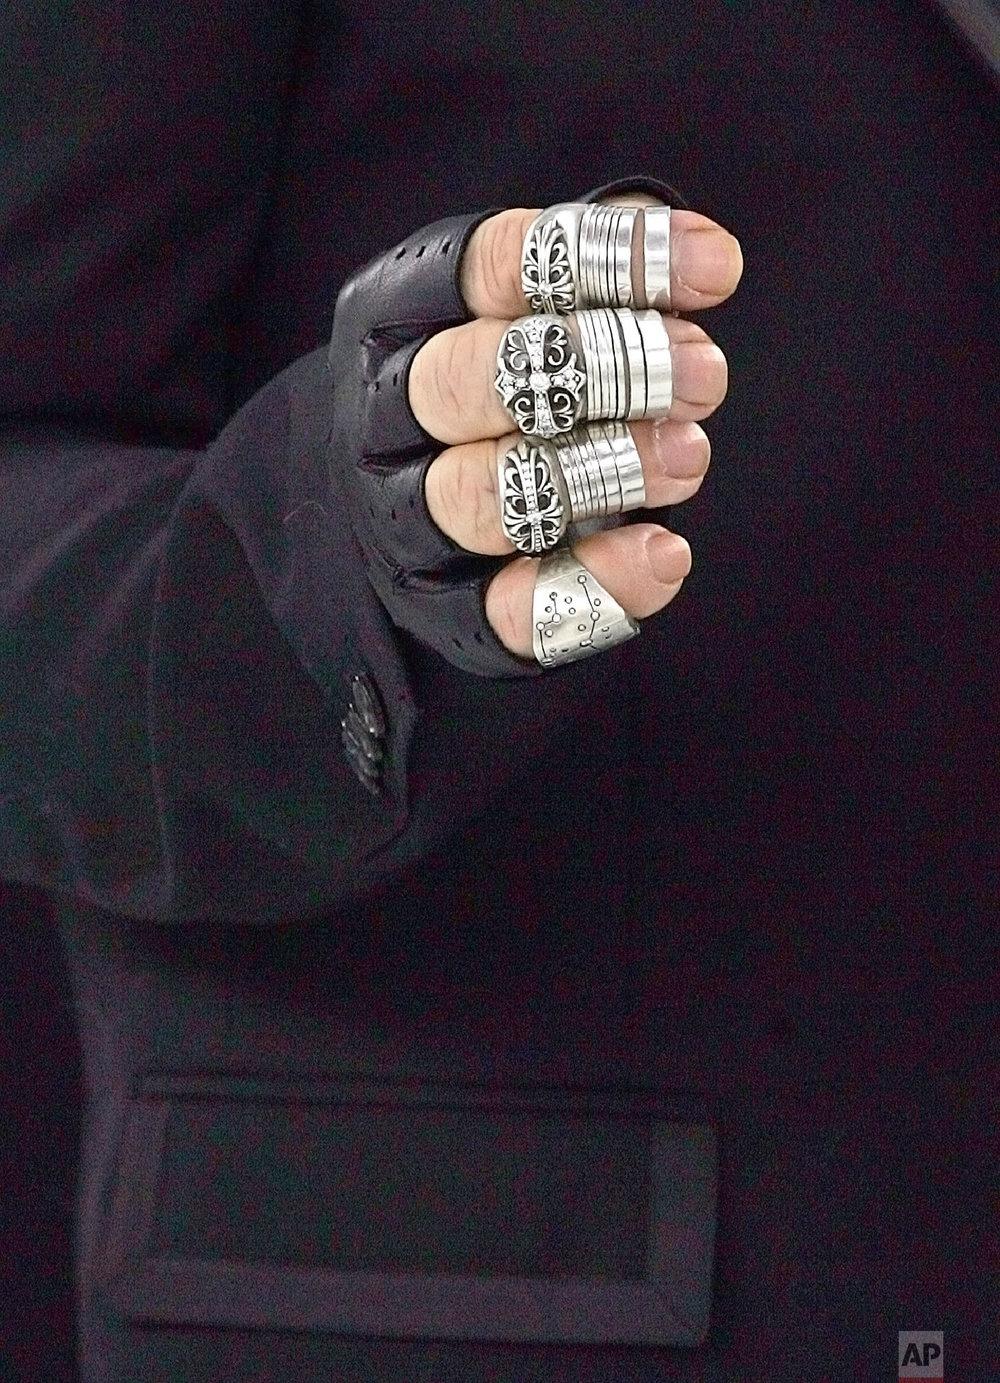 Lagerfeld's hand is seen backstage Jan. 25, 2005 in Paris. (AP Photo/Jerome Delay)